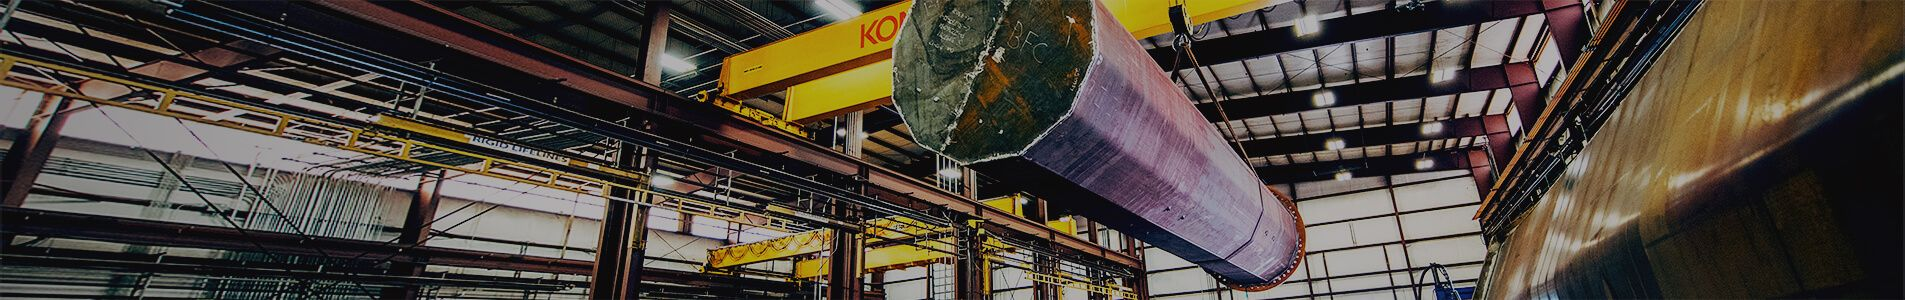 Utility pole hoisted in warehouse